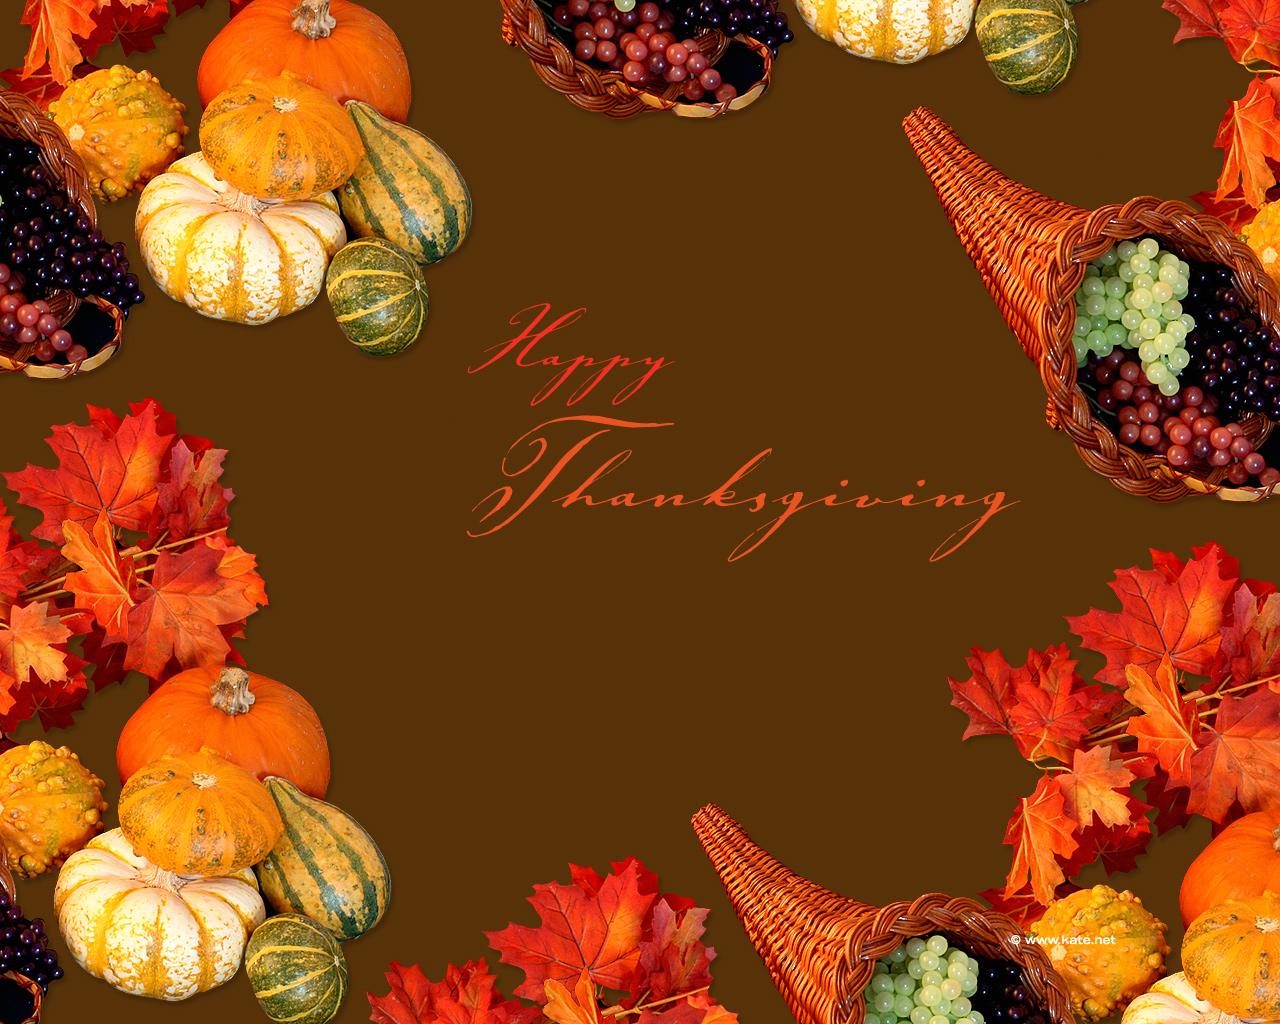 Free Thanksgiving Computer Wallpaper Backgrounds - WallpaperSafari